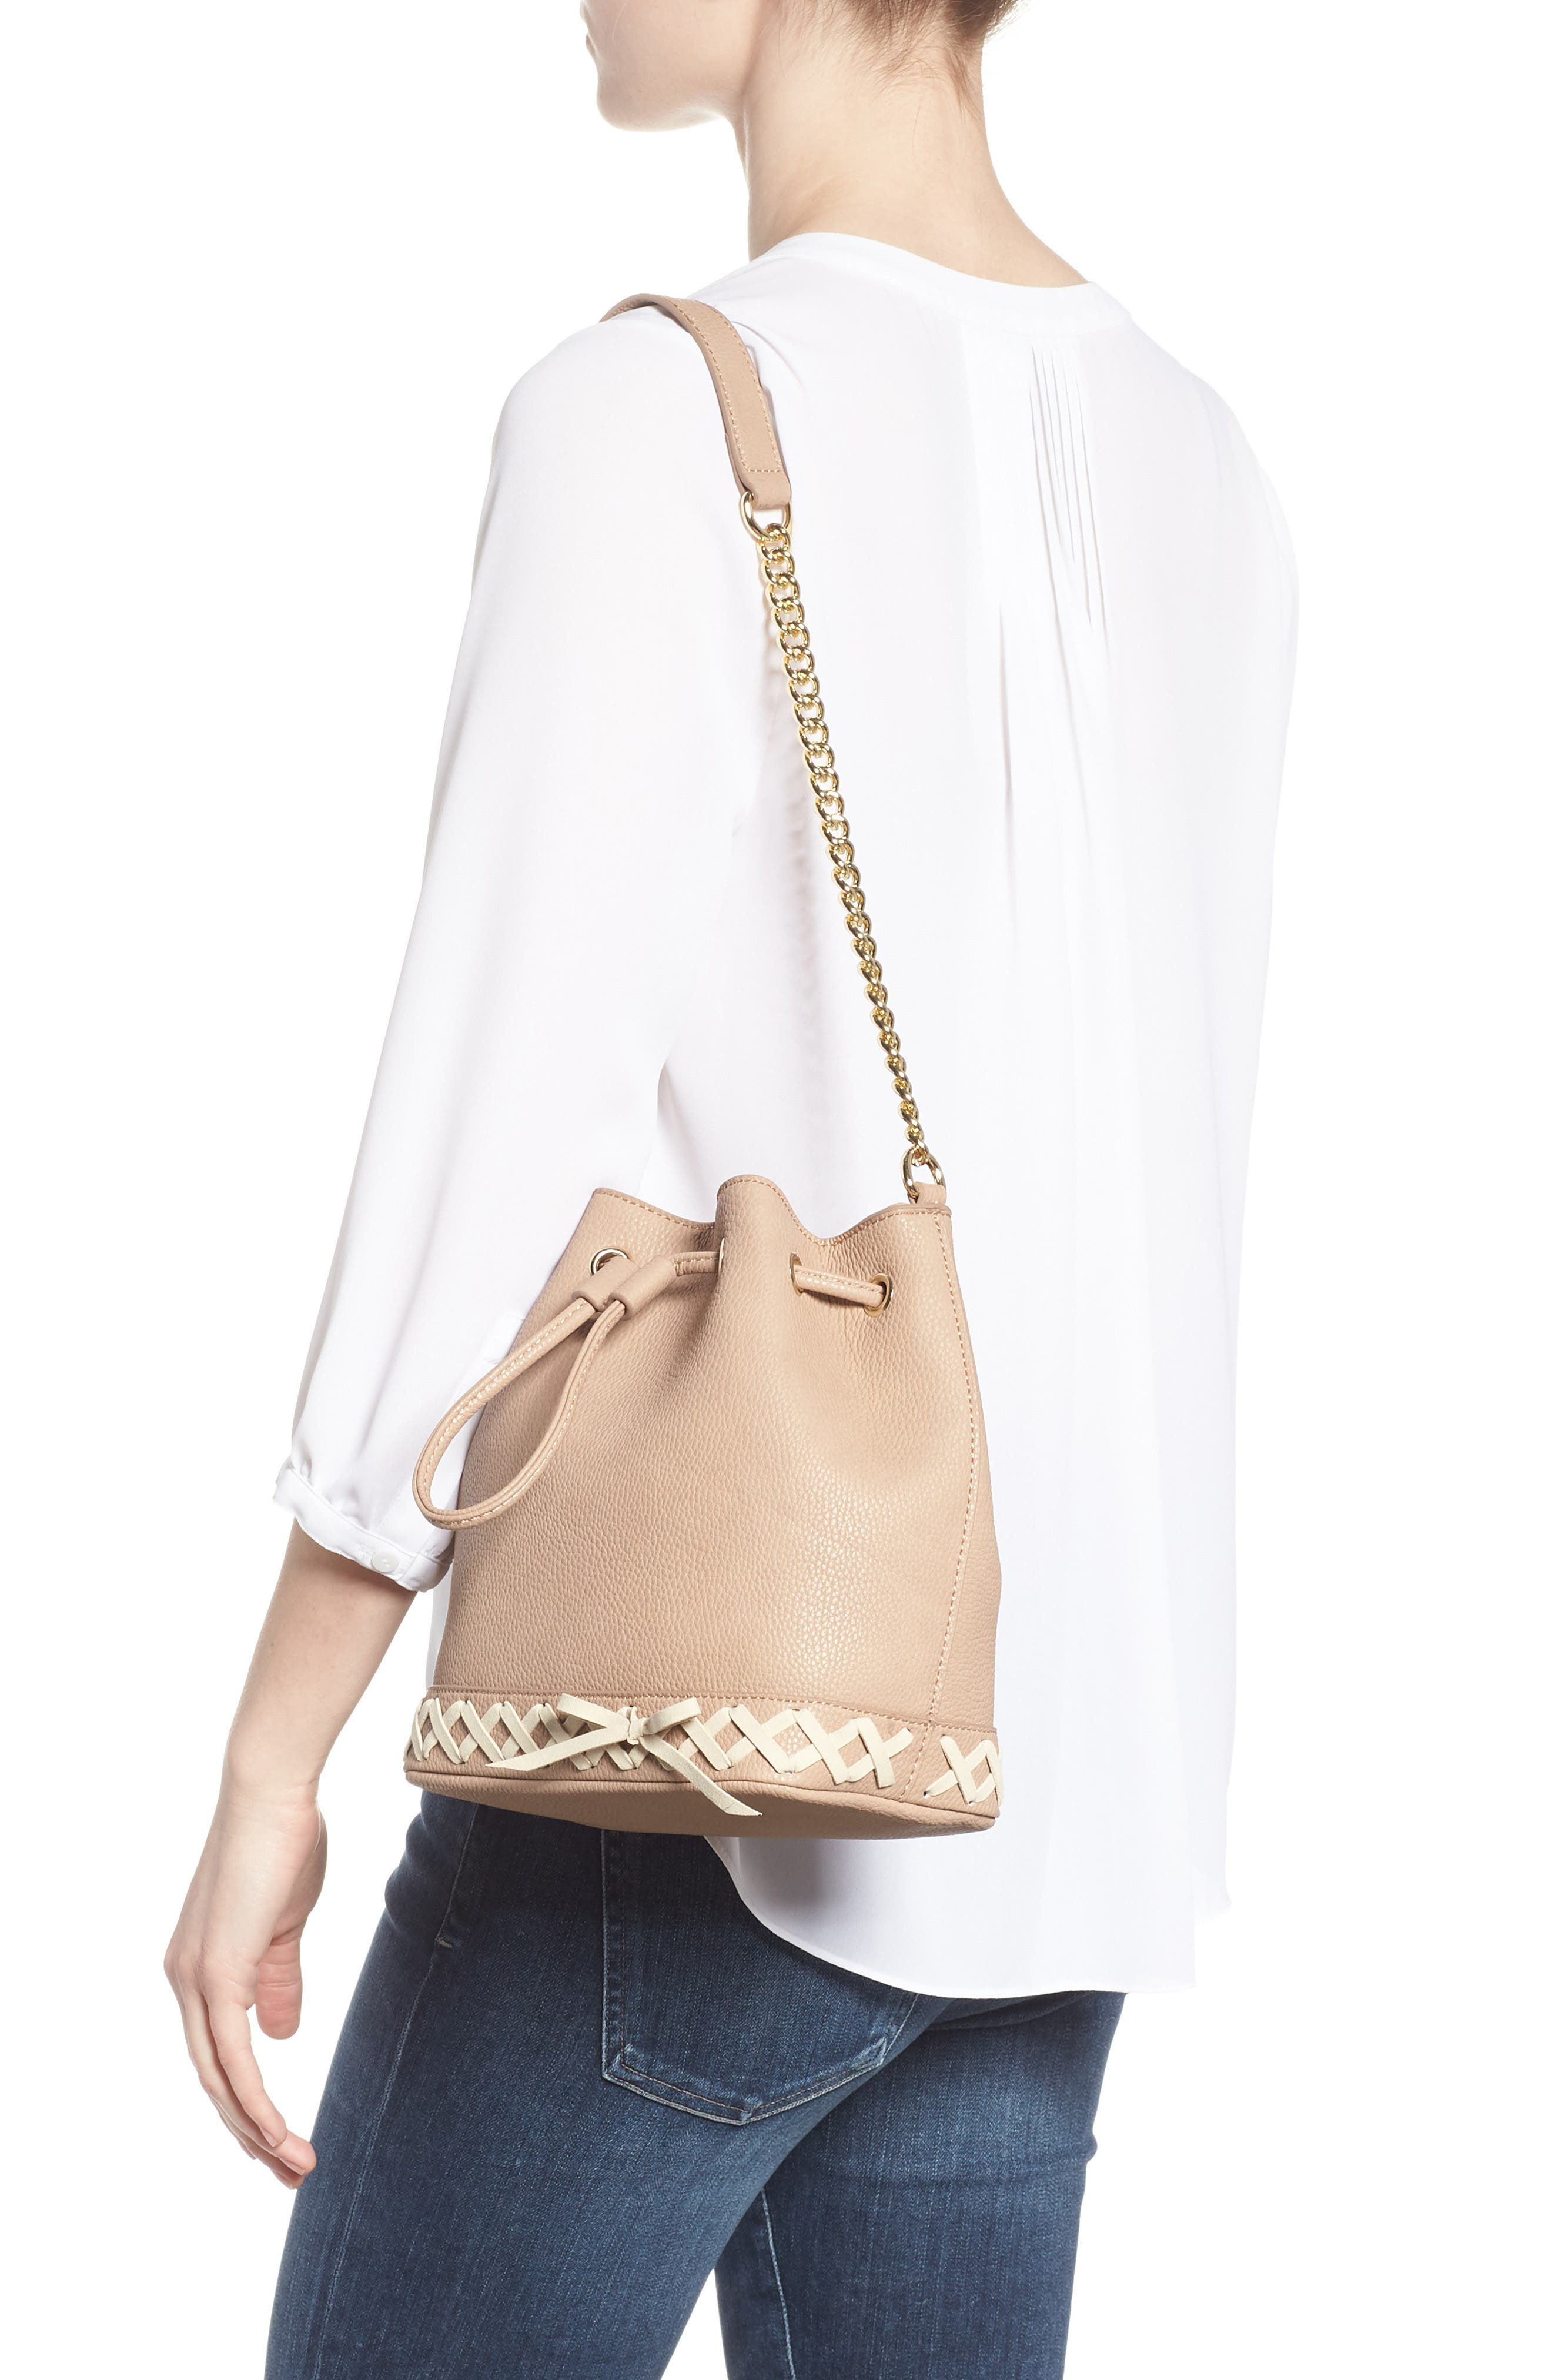 Veronica Faux Leather Bucket Bag,                             Alternate thumbnail 2, color,                             250